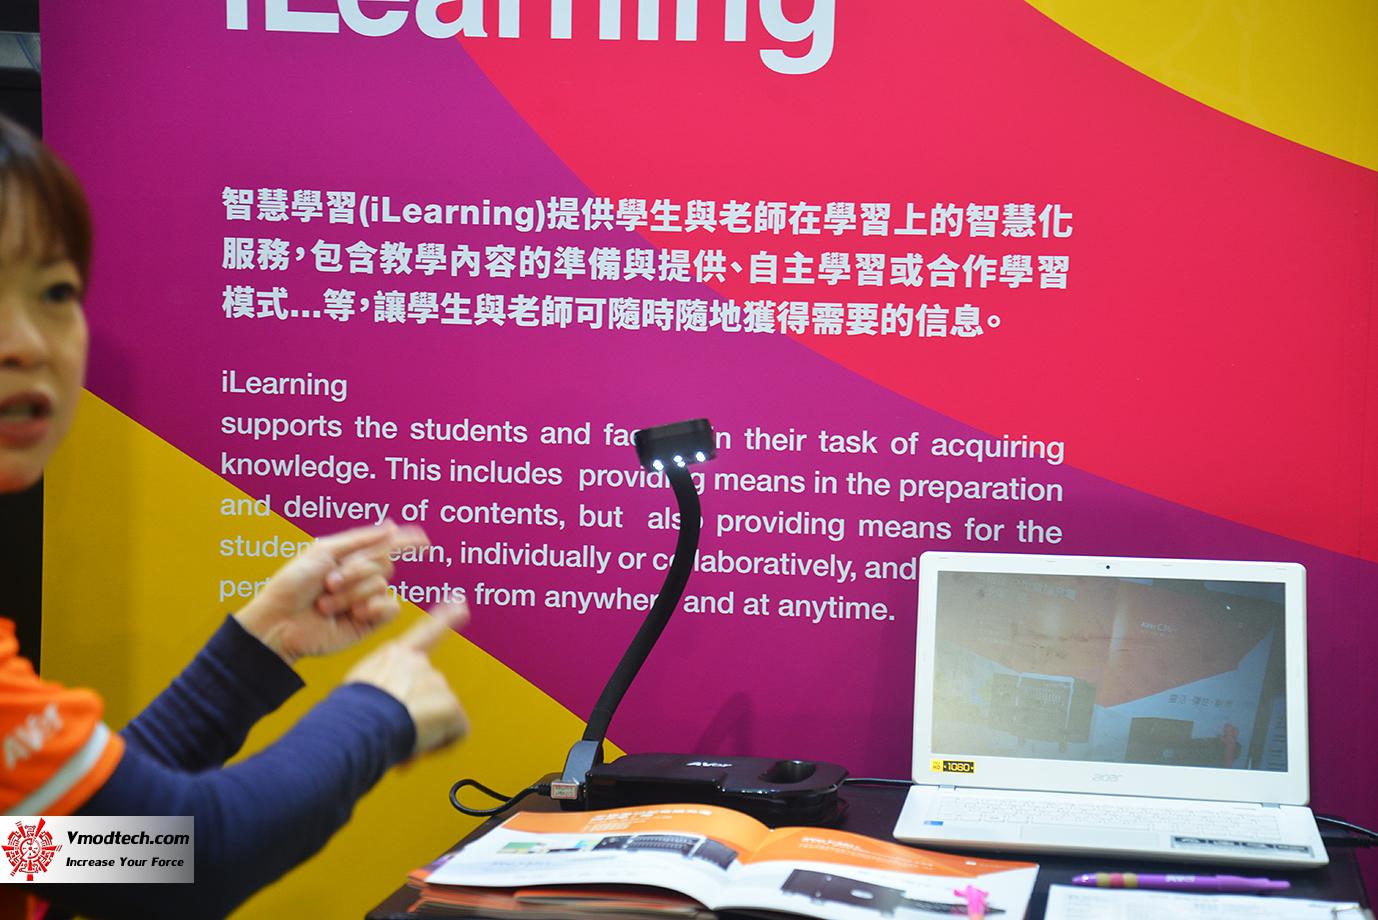 dsc 8417 เยี่ยมชมบูธ Smart Education ระบบการศึกษาอัจฉริยะในงาน 2019 SMART CITY SUMMIT & EXPO ณ กรุงไทเป ประเทศไต้หวัน